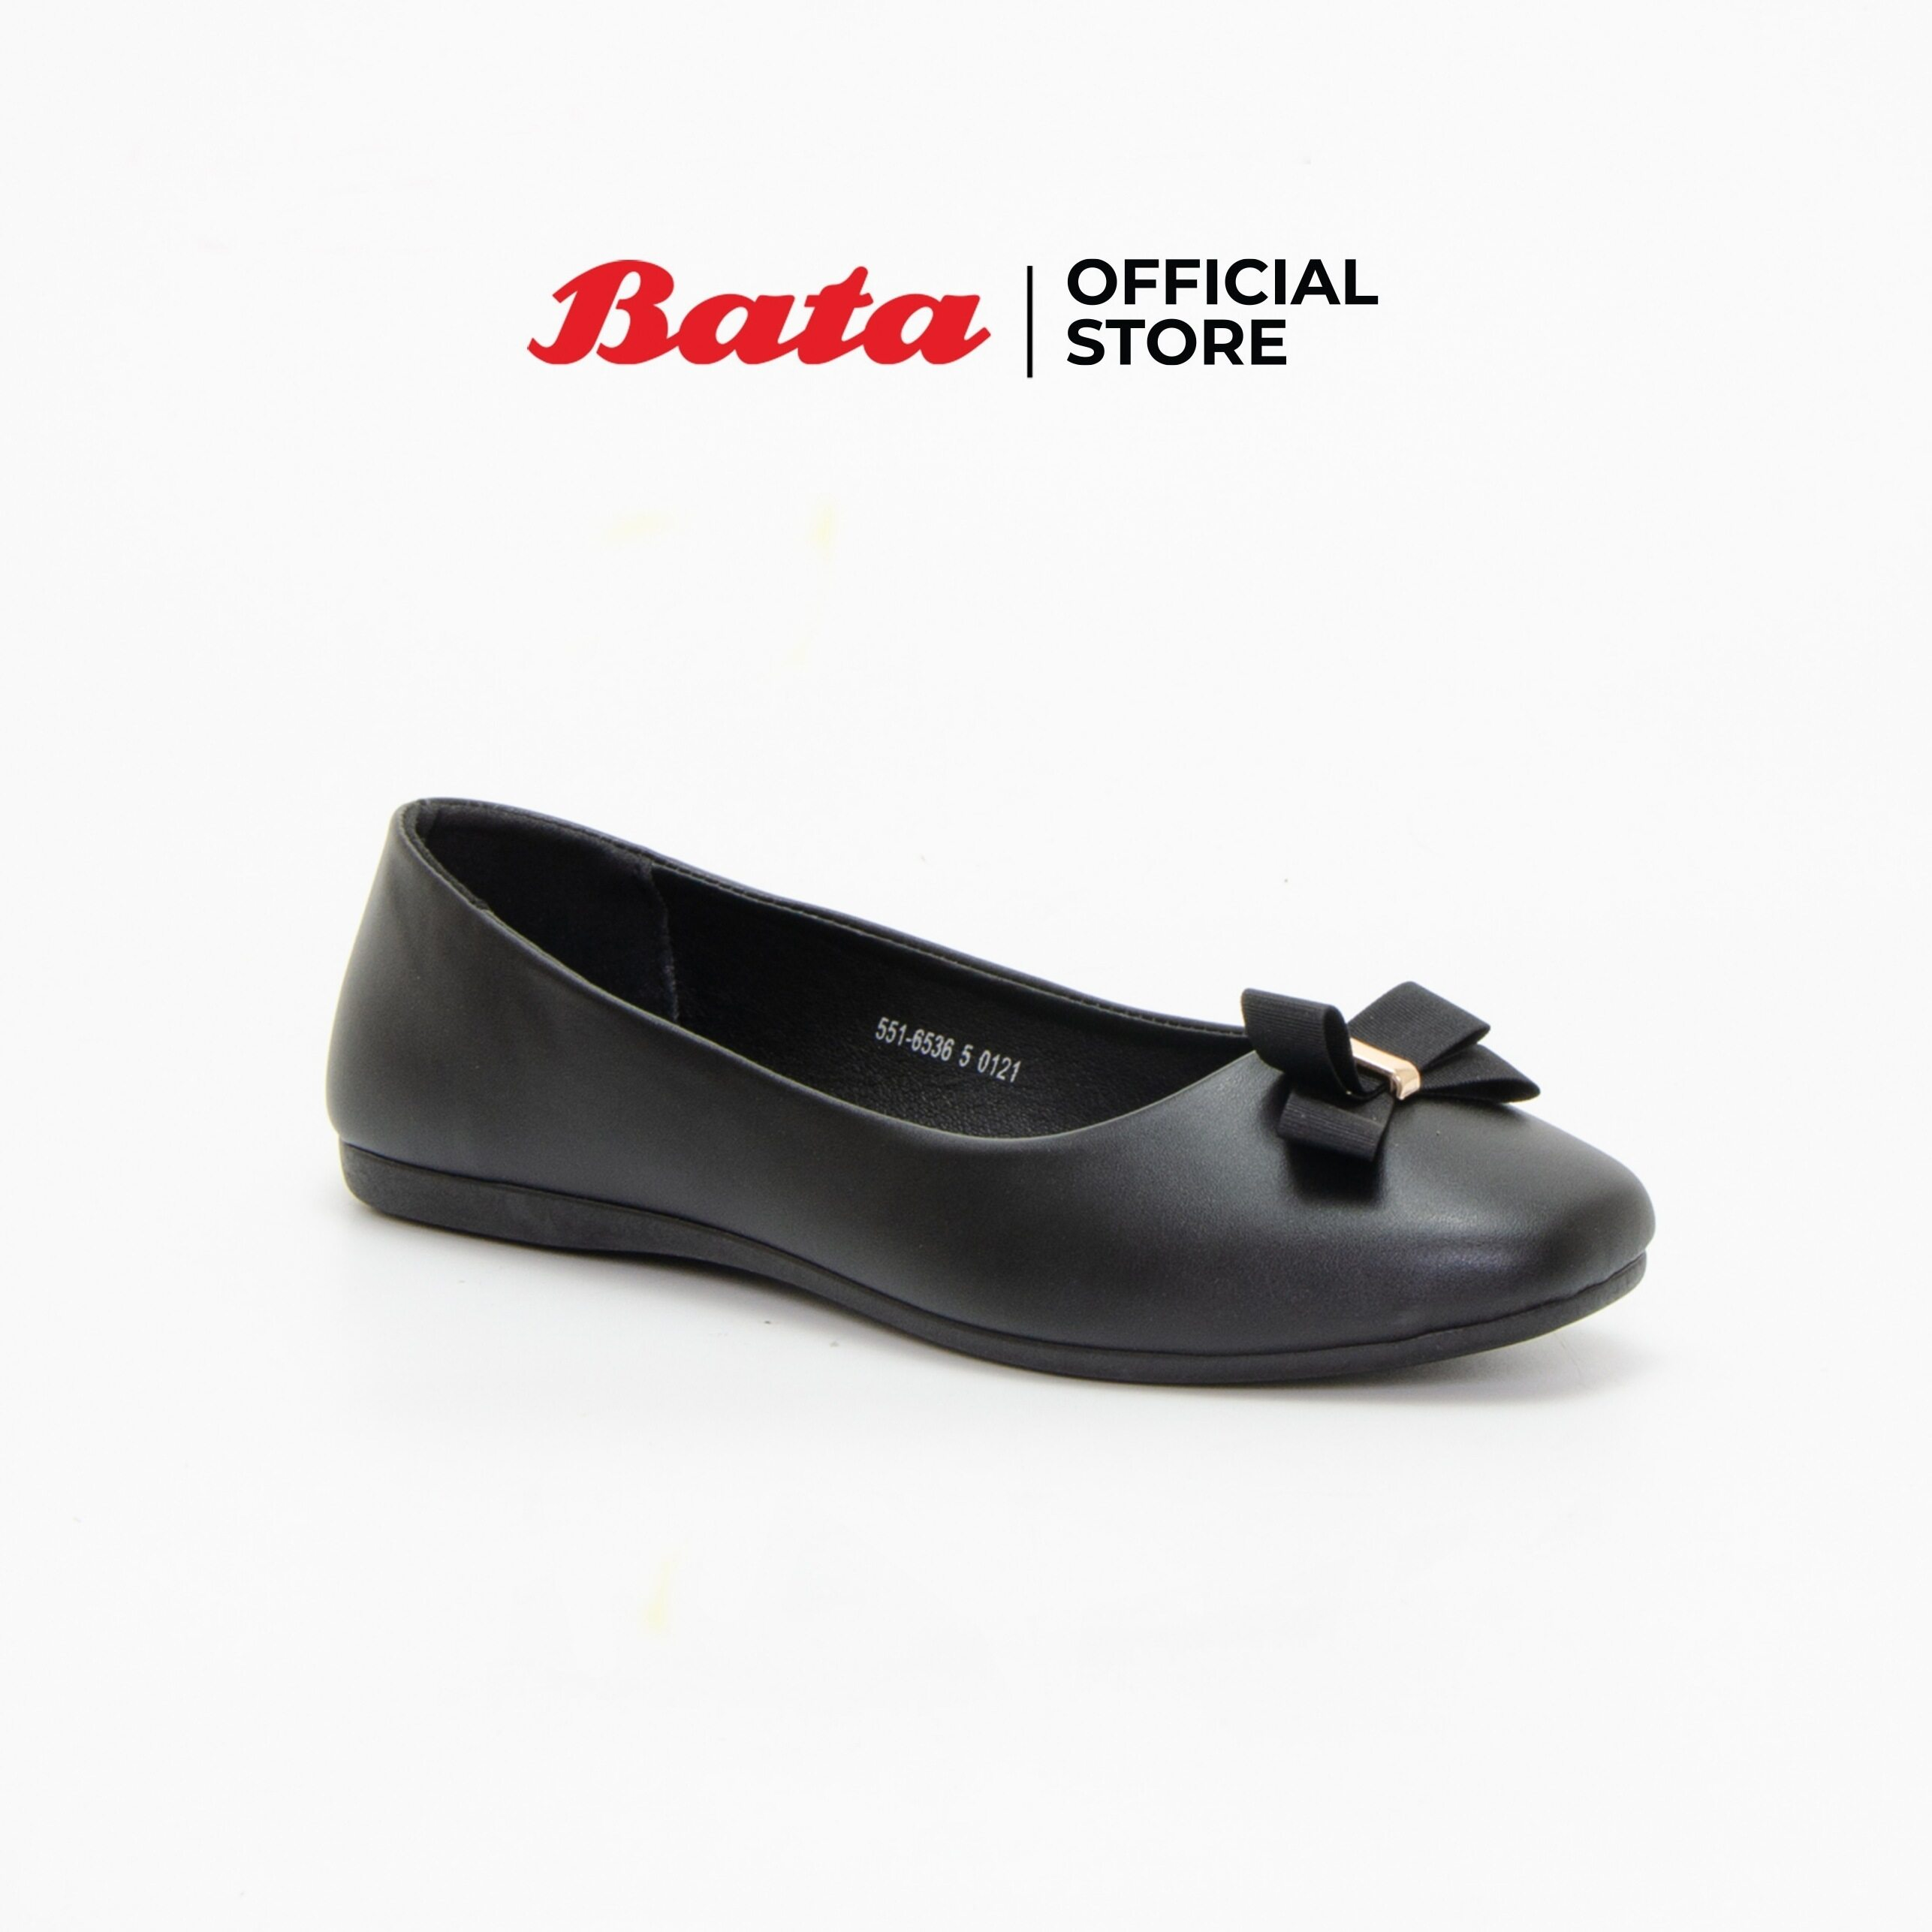 Bata Womens Ballerina Flats รองเท้าบัลเล่ต์แฟลตสำหรับผู้หญิง รุ่น Bindi สีดำ 5516536.